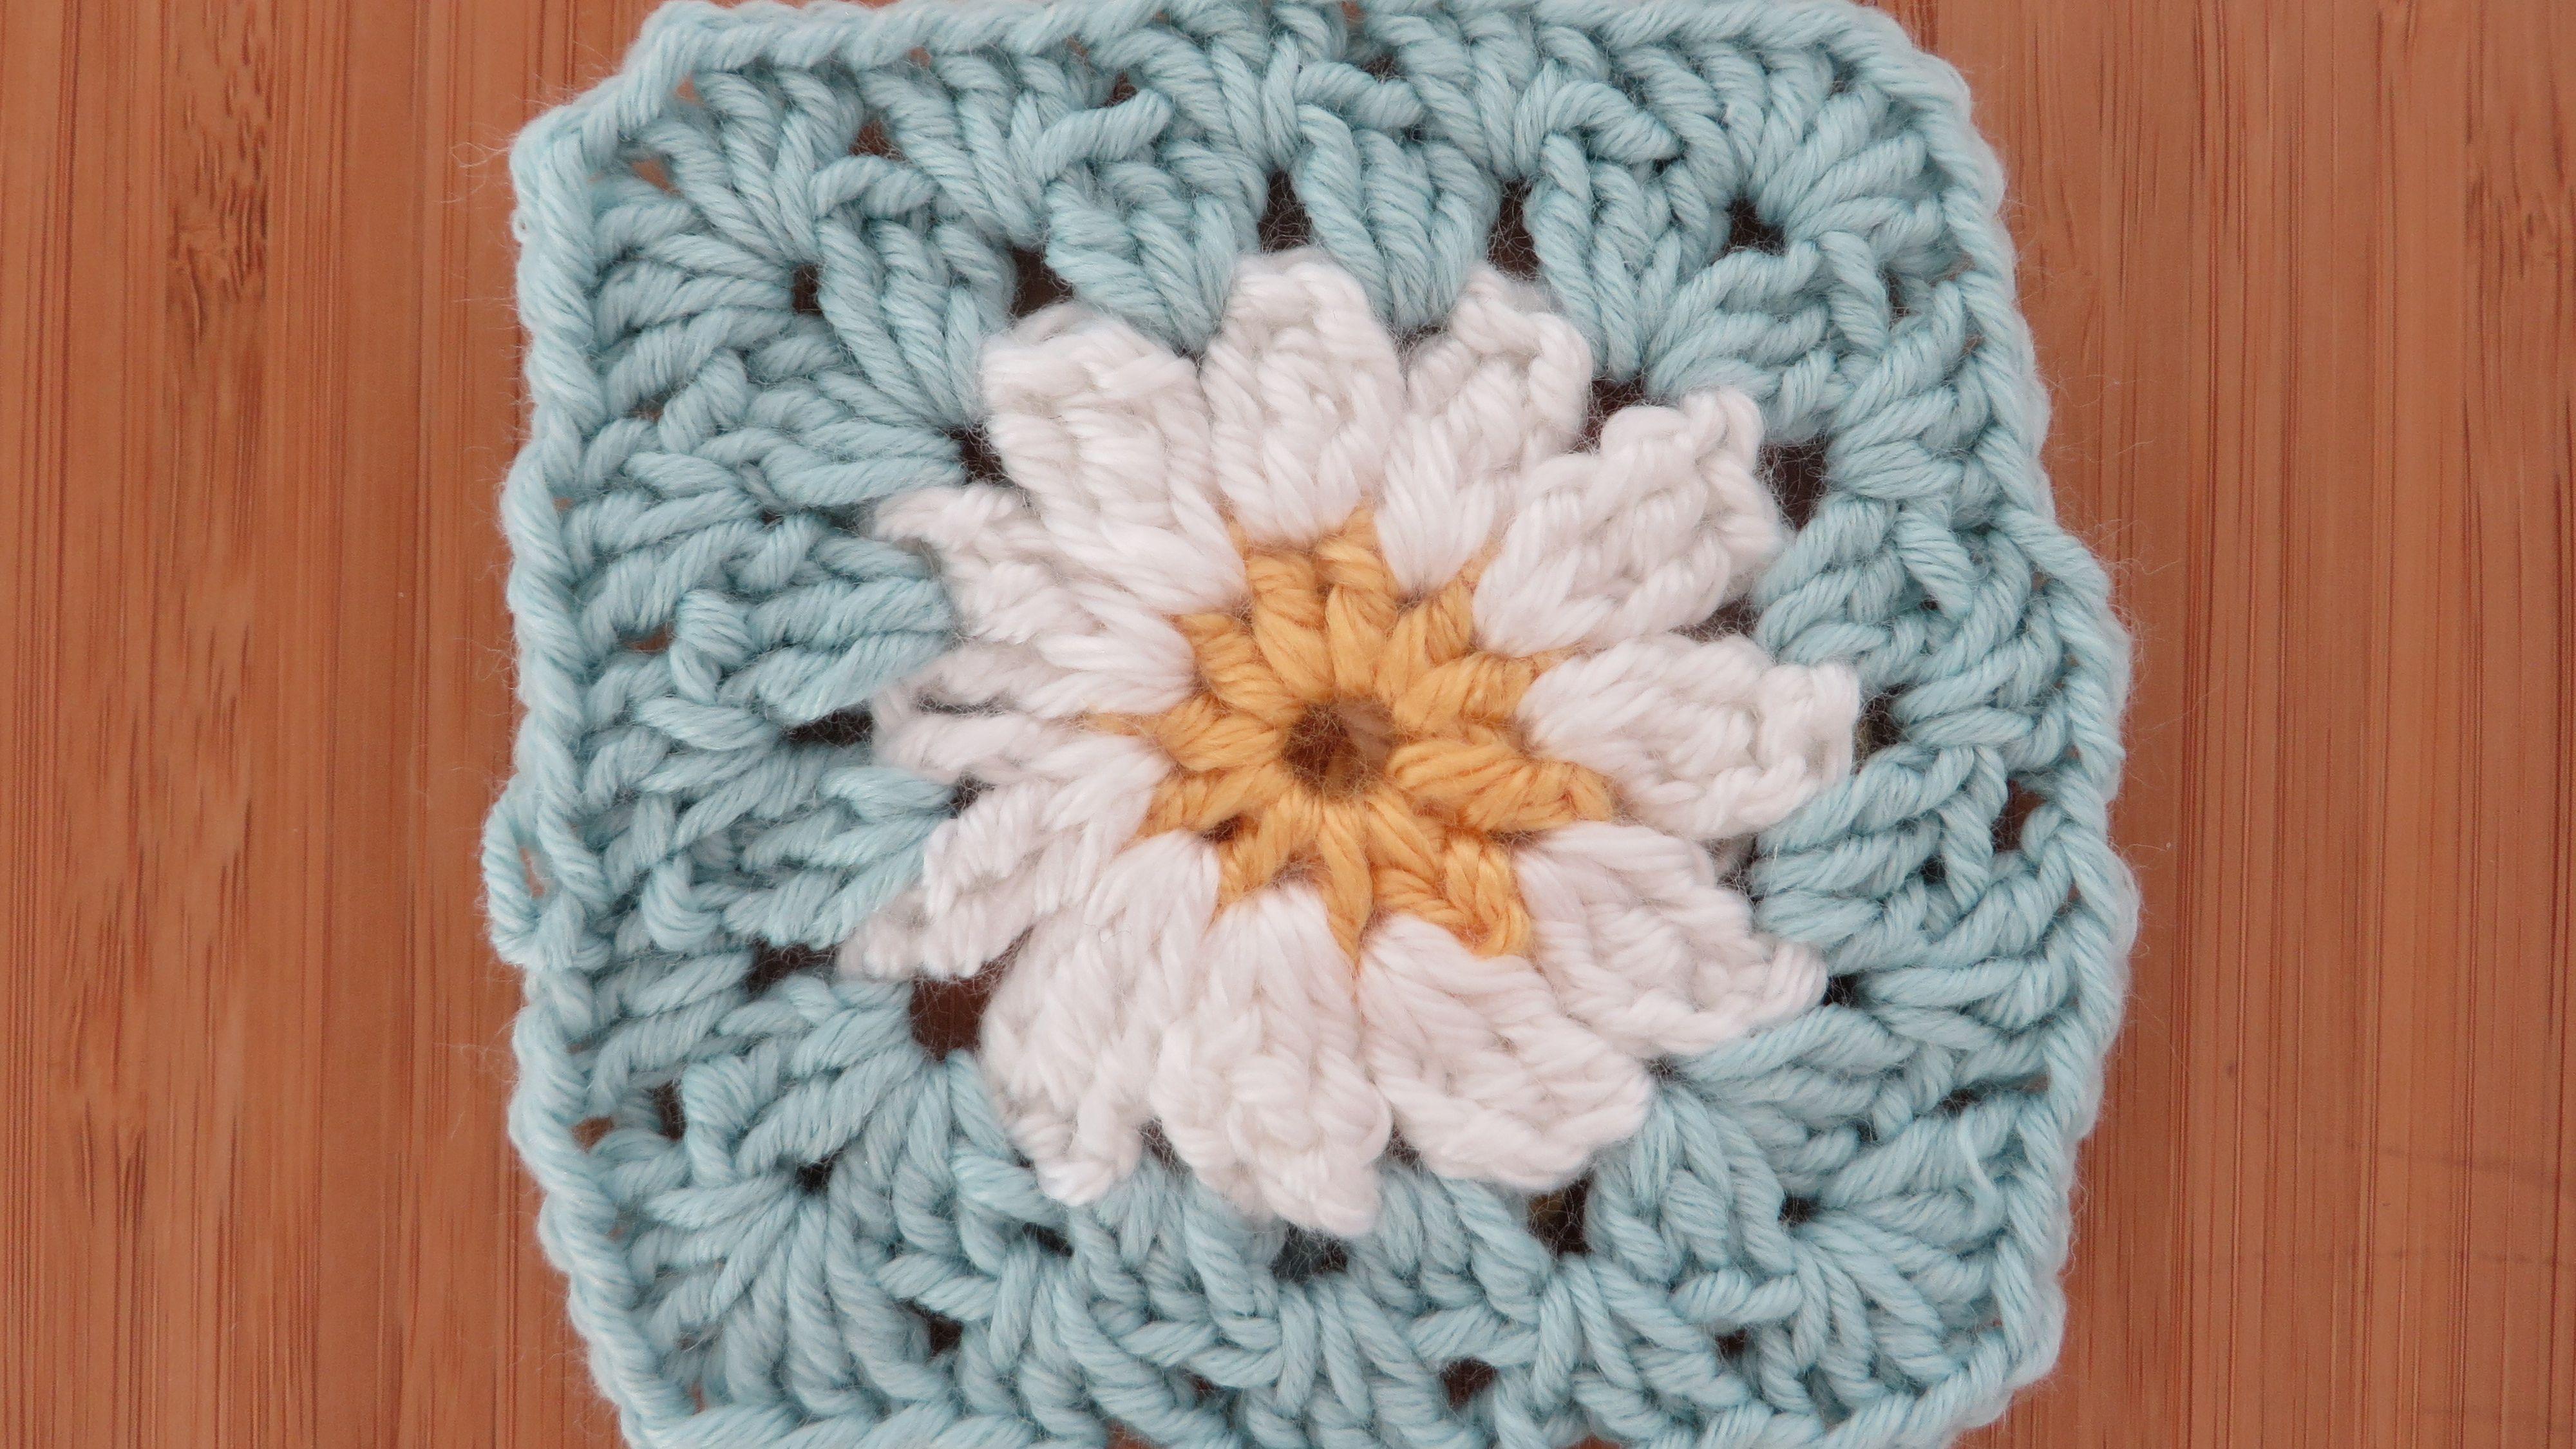 How To Crochet 3D Flower Granny Square Baby Blanket